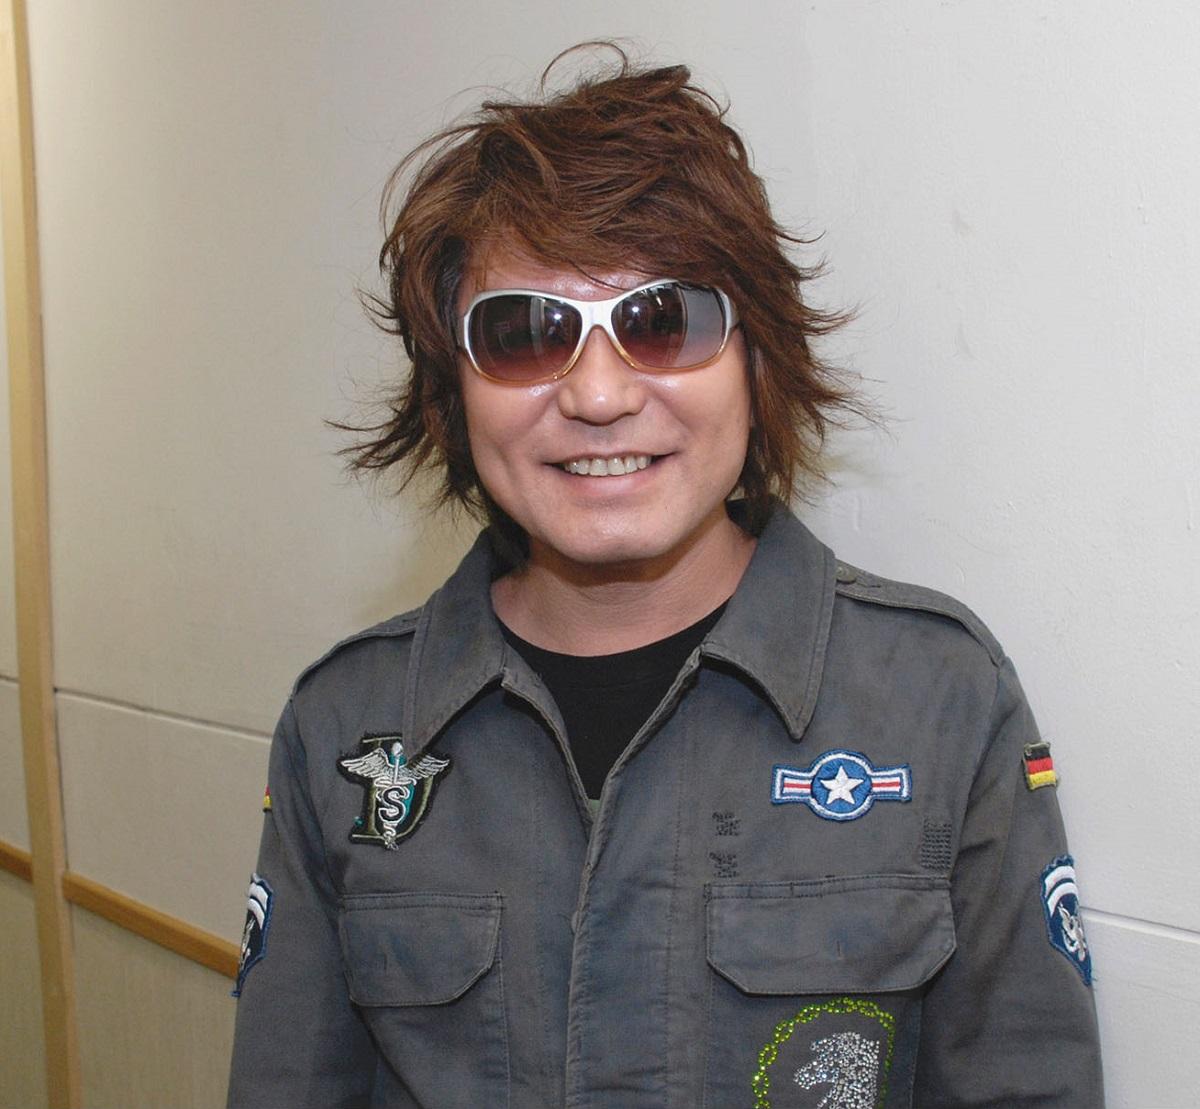 T.AKIRA(本名:玉元晃) 歌手(フィンガー5)2008OP写真通信社